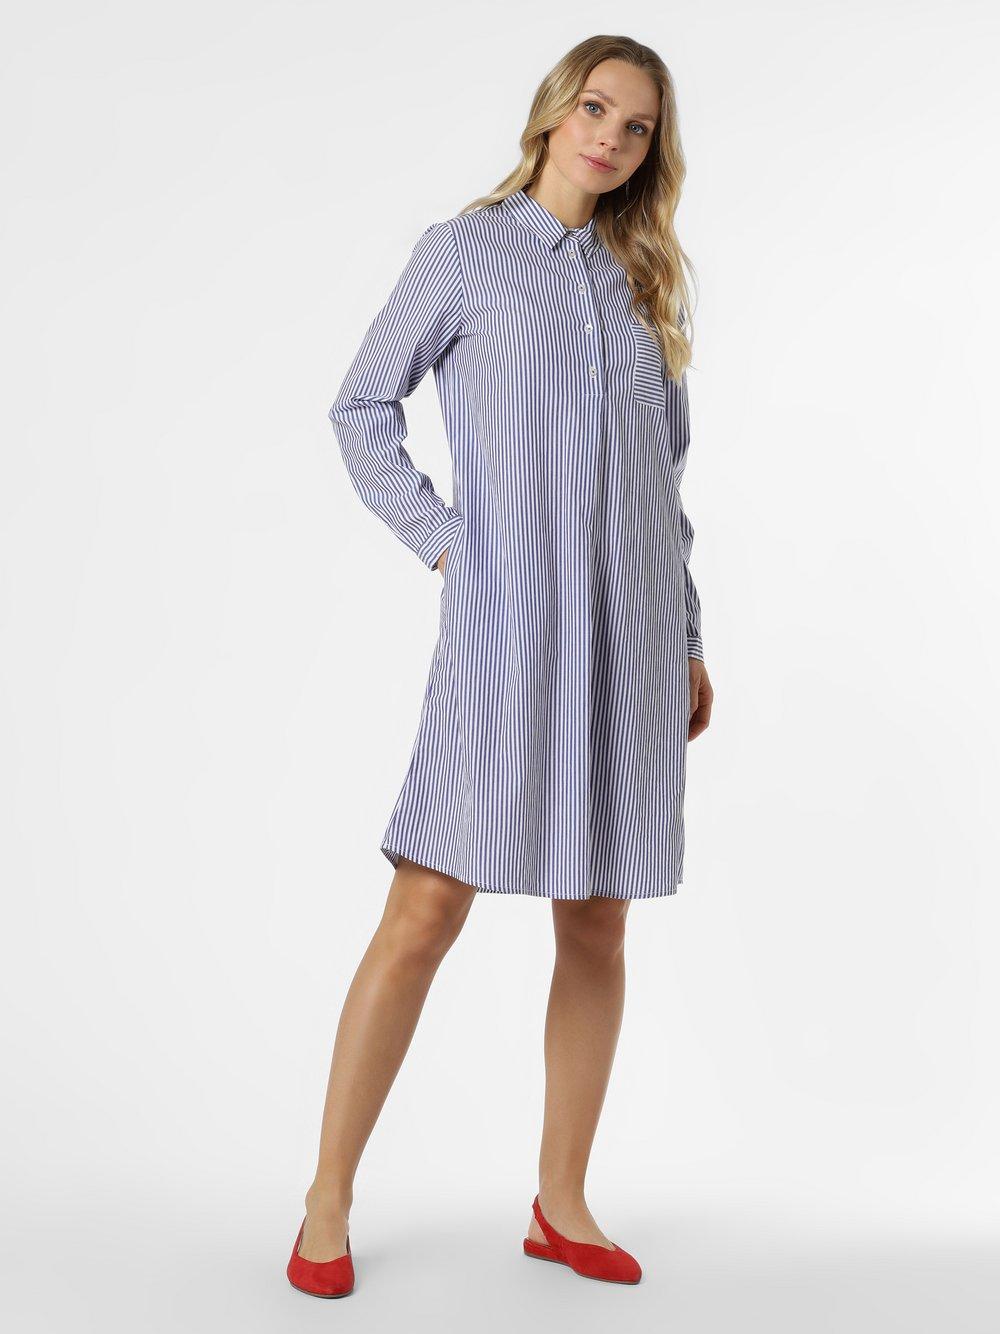 Emily van den Bergh - Sukienka damska, niebieski